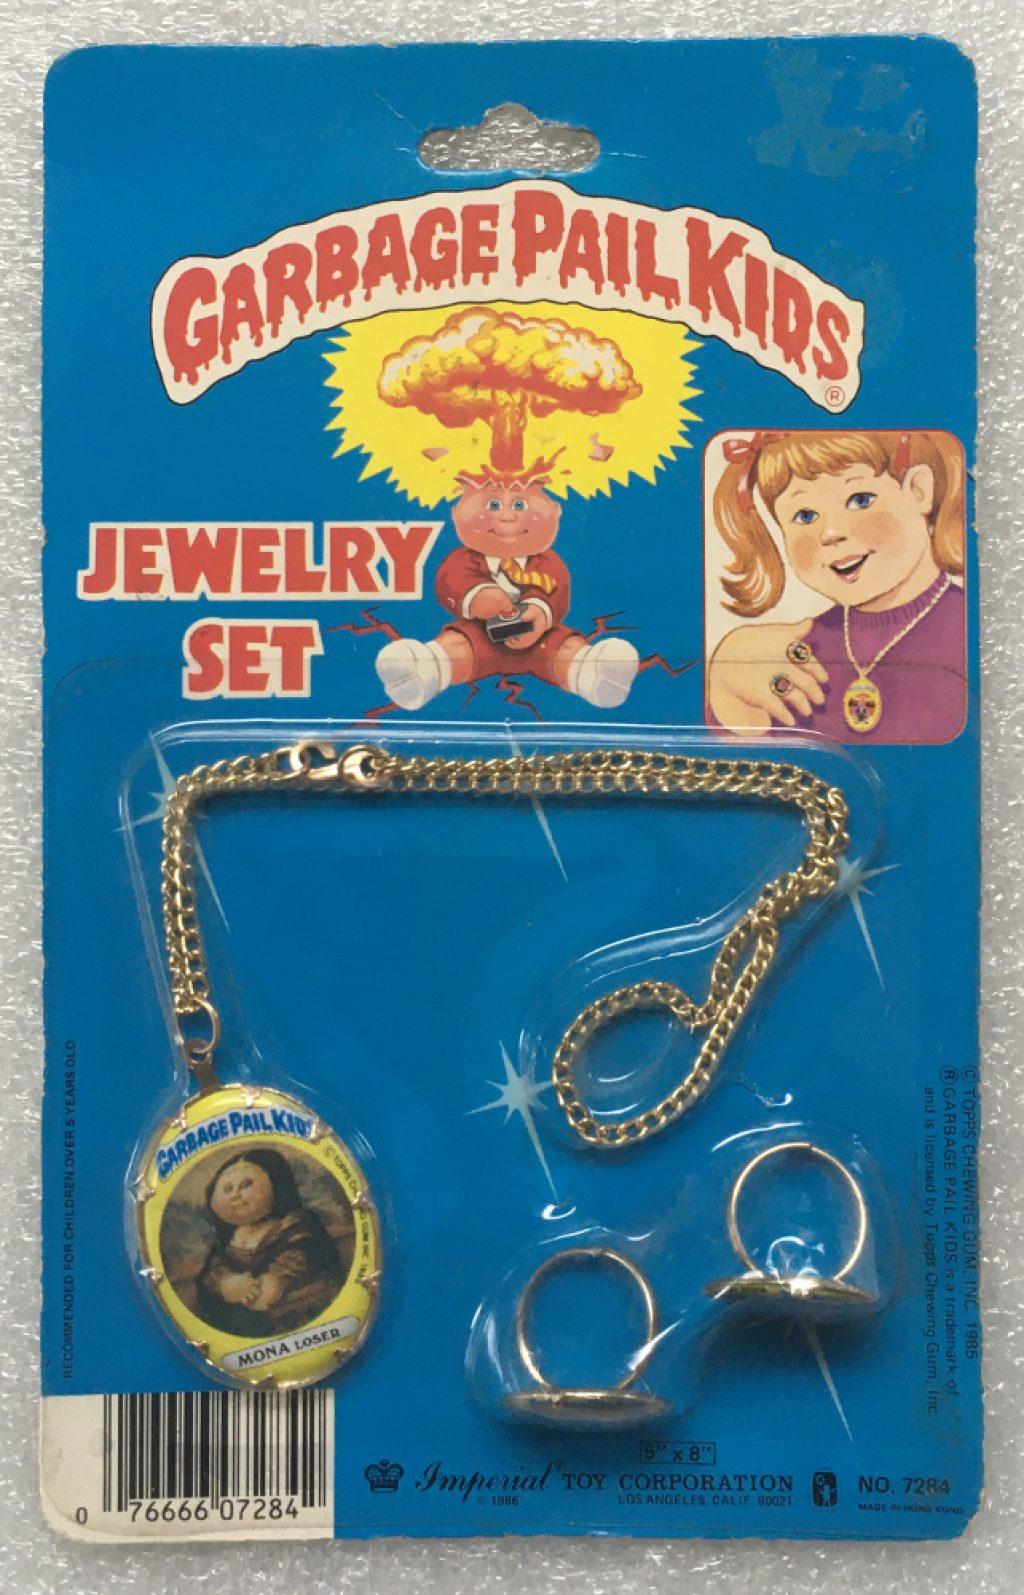 1985 Garbage Pail Kids Jewelry Set - Mona Loser, Blasted Billy & Unstitched Mitch: Sealed